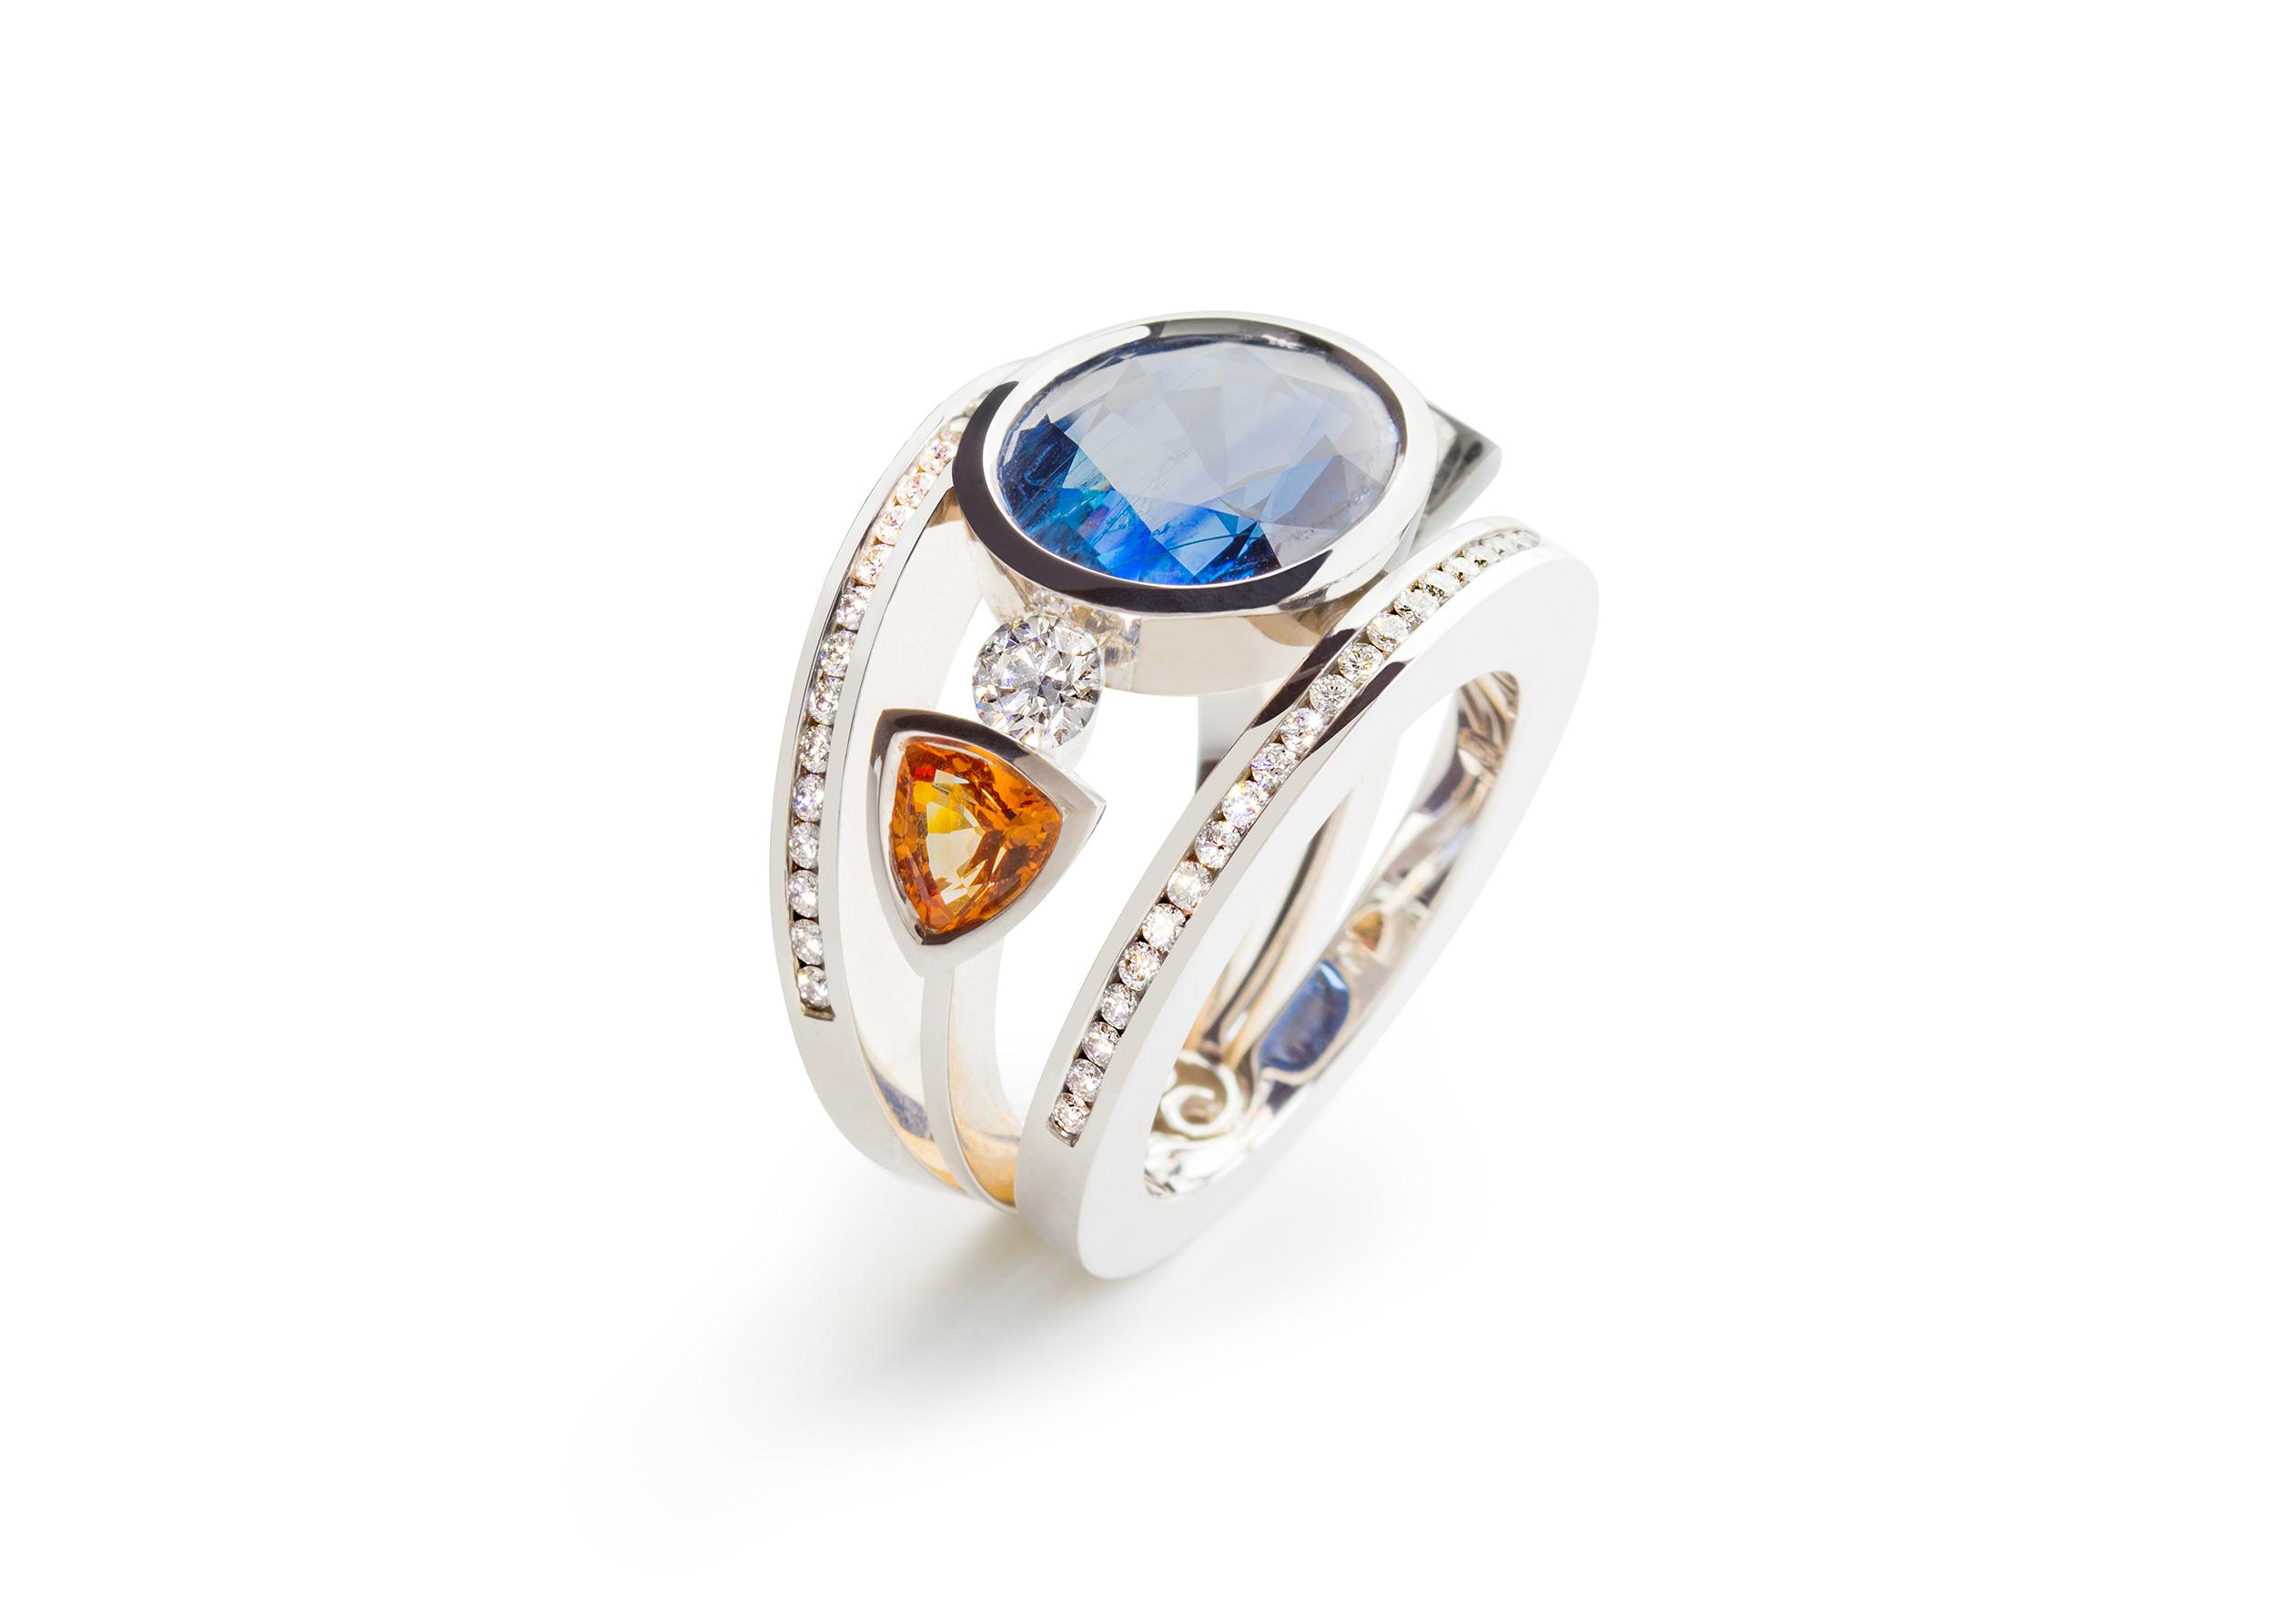 Eigenmann Ring